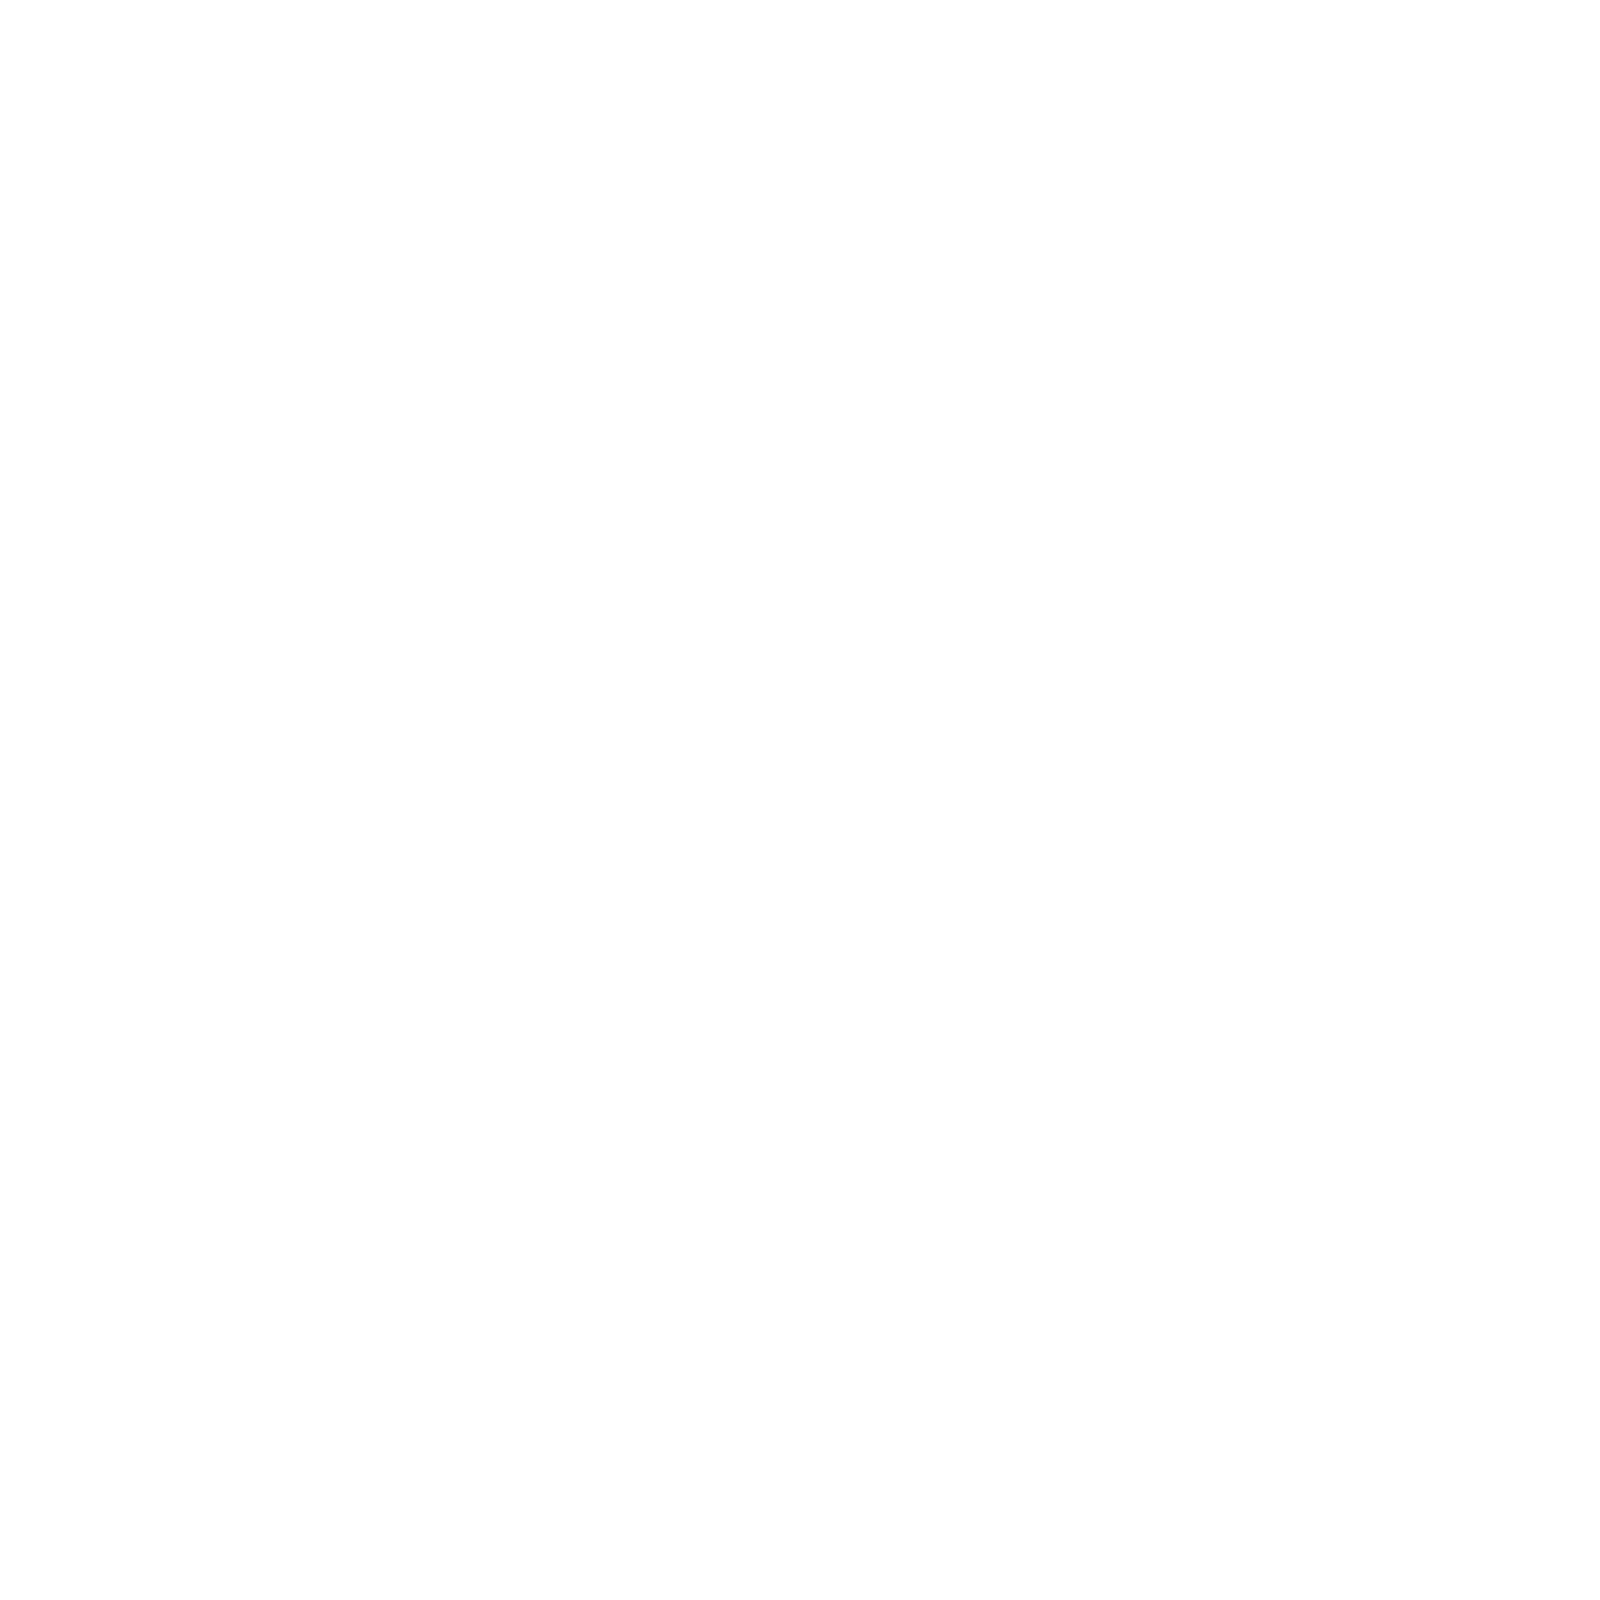 zte-project-logo